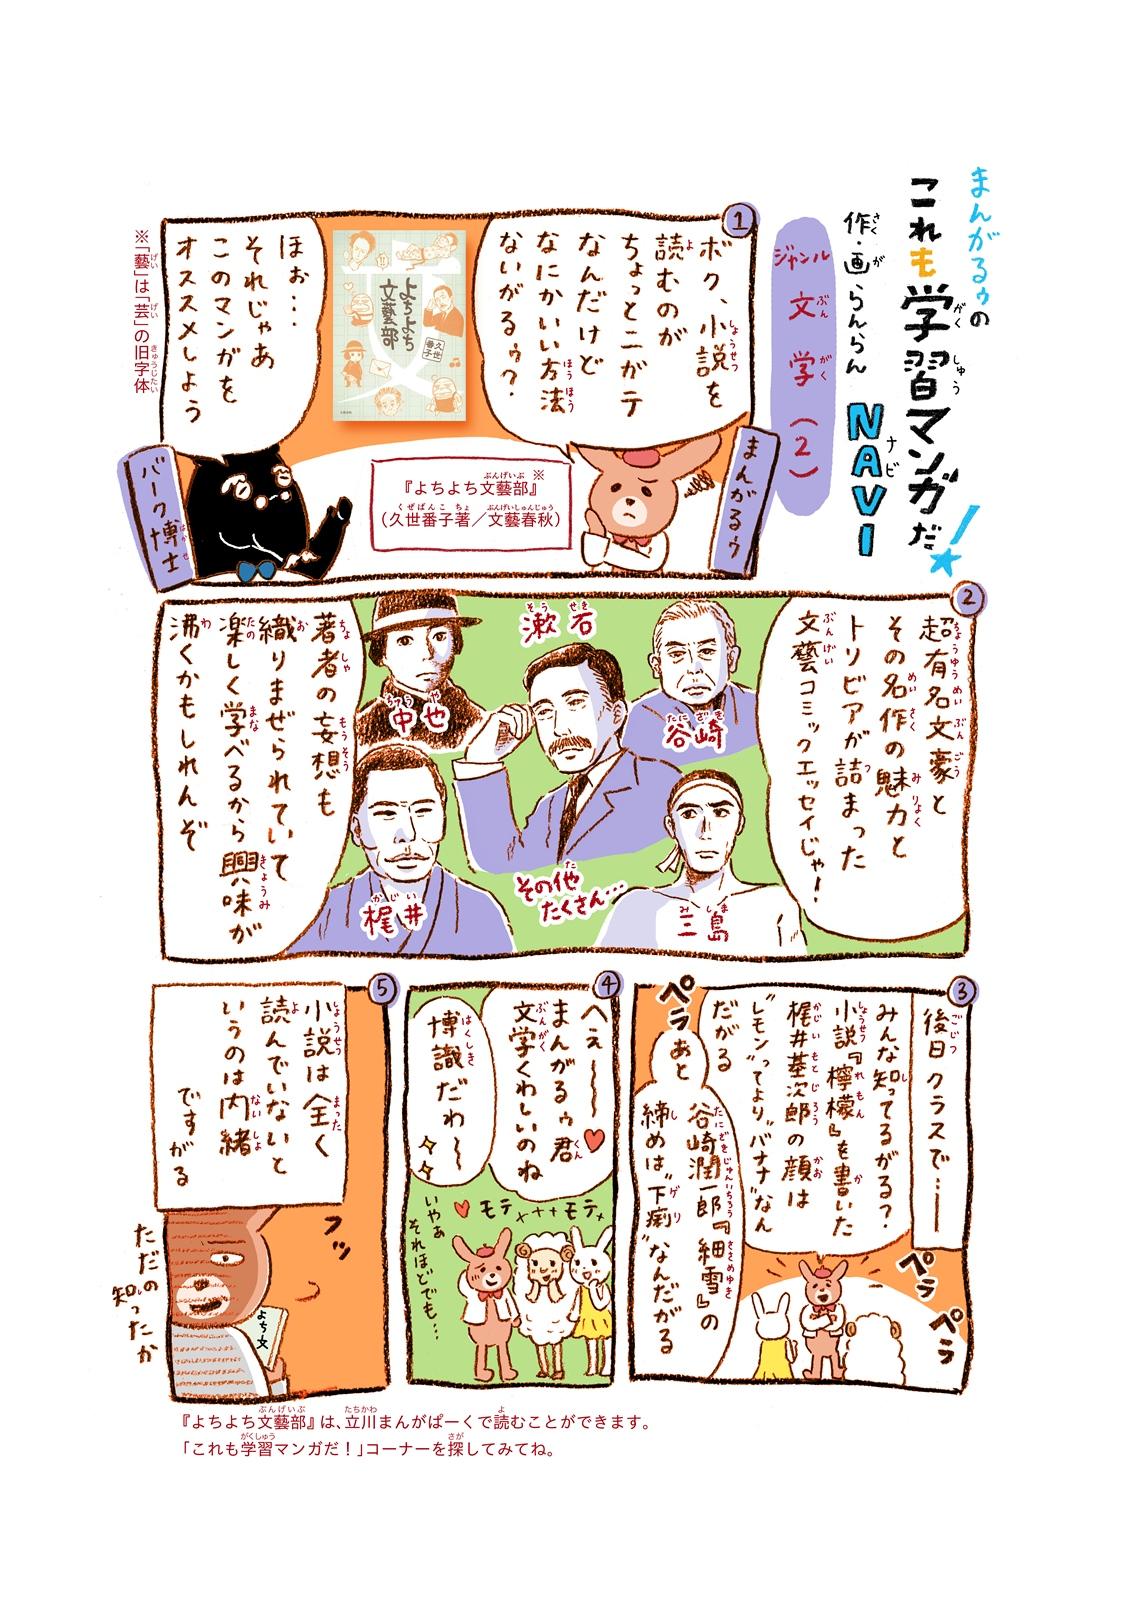 https://mangapark.jp/topics/2020/12/30/images/mangaloo_vol15.jpg